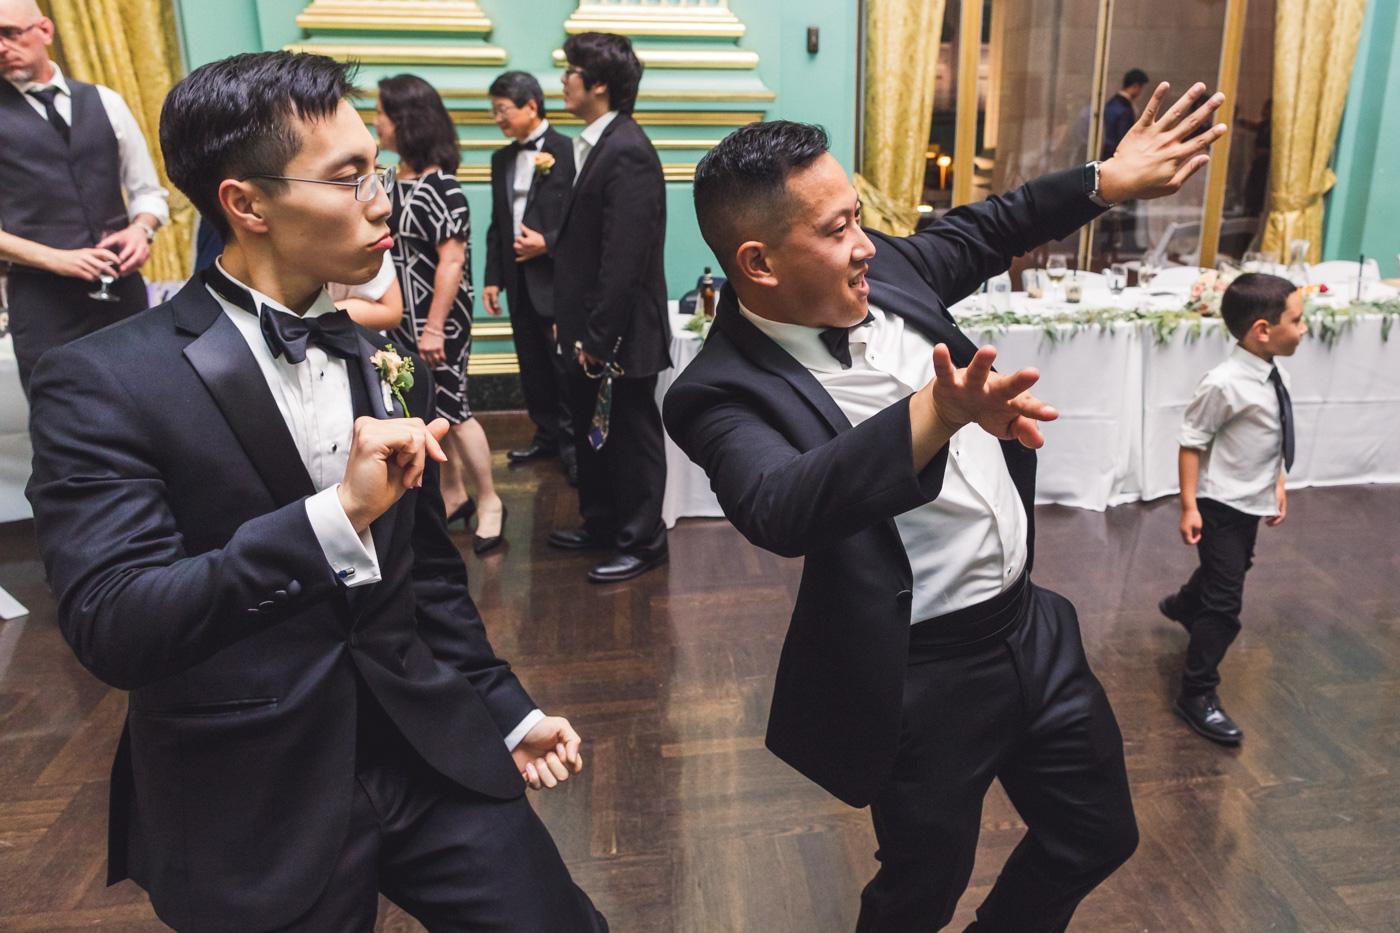 groom-and-groomsman-dancing